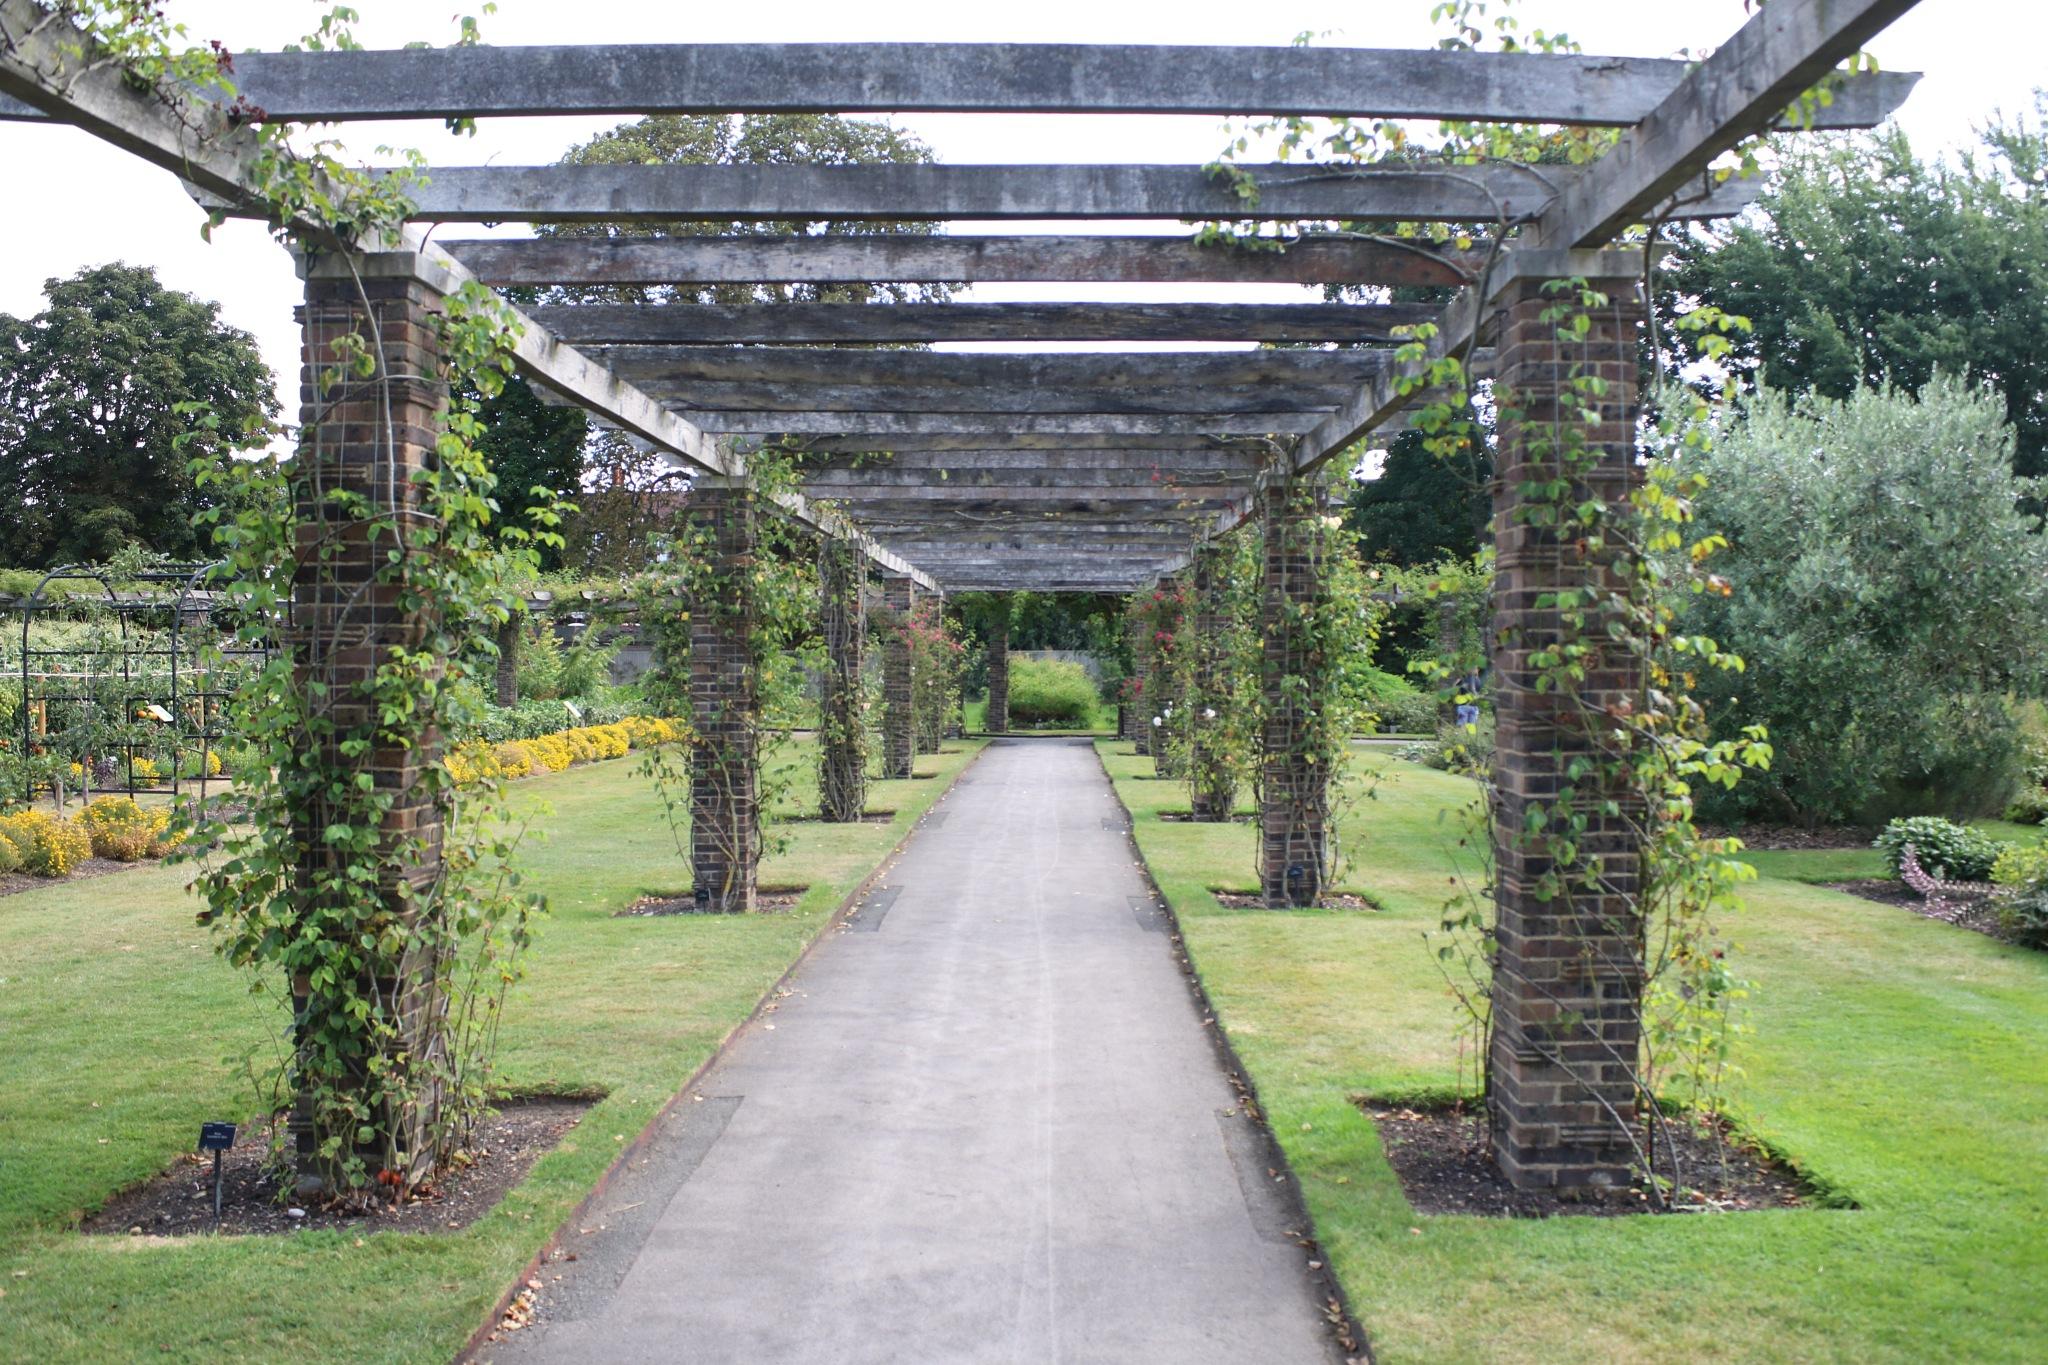 Taken at The Royal Kew Gardens, Surrey. by Mo Dessouki